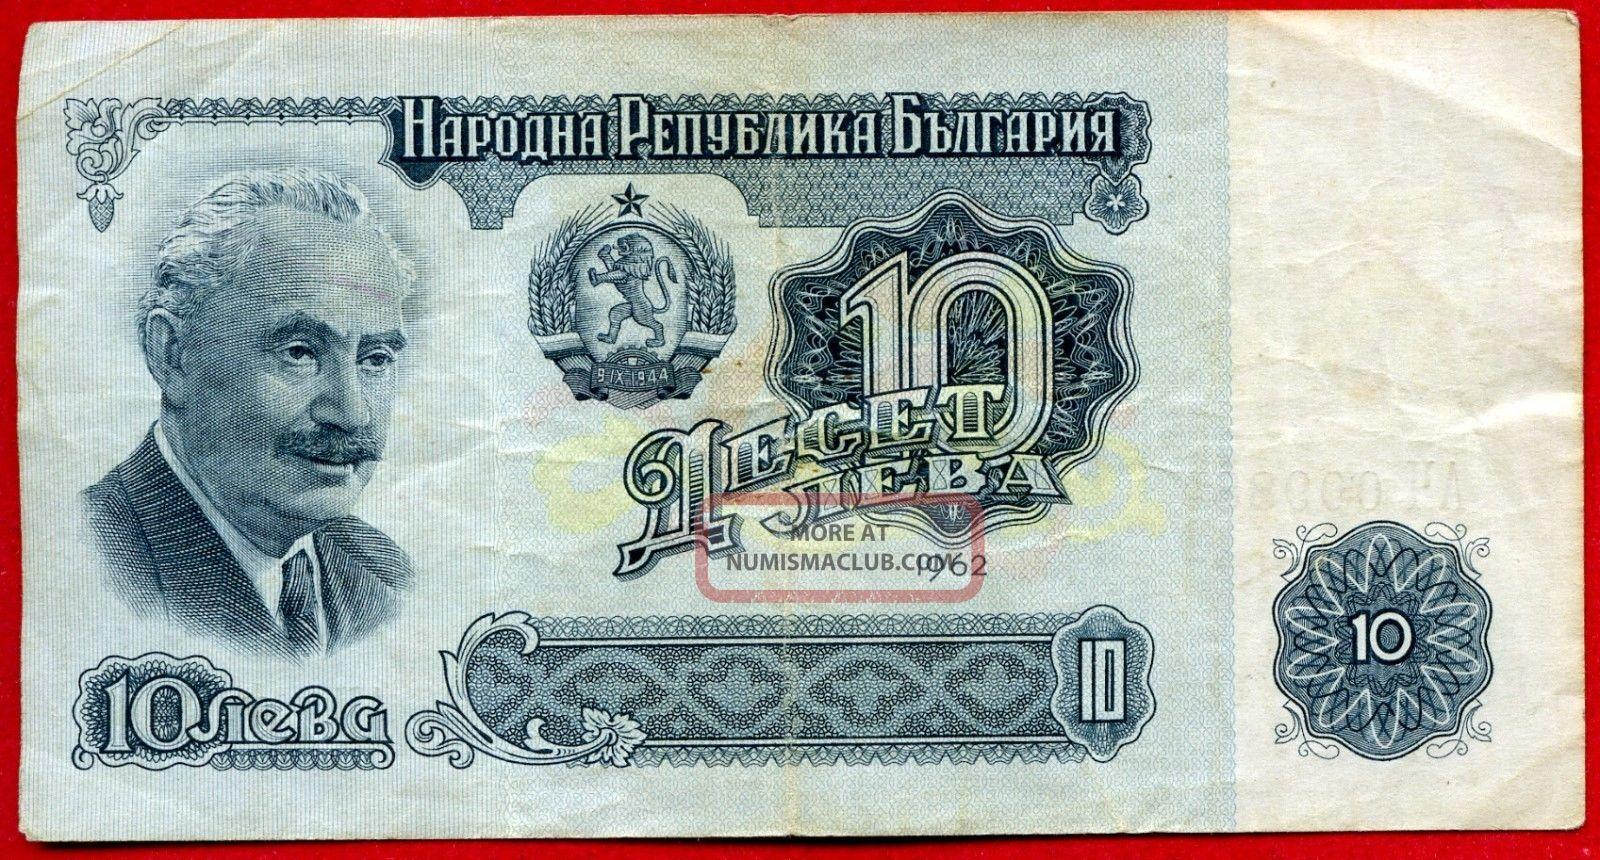 Bulgaria 10 Leva 1962 P - 91 Monev 90 Vf Circulated Banknote Europe photo